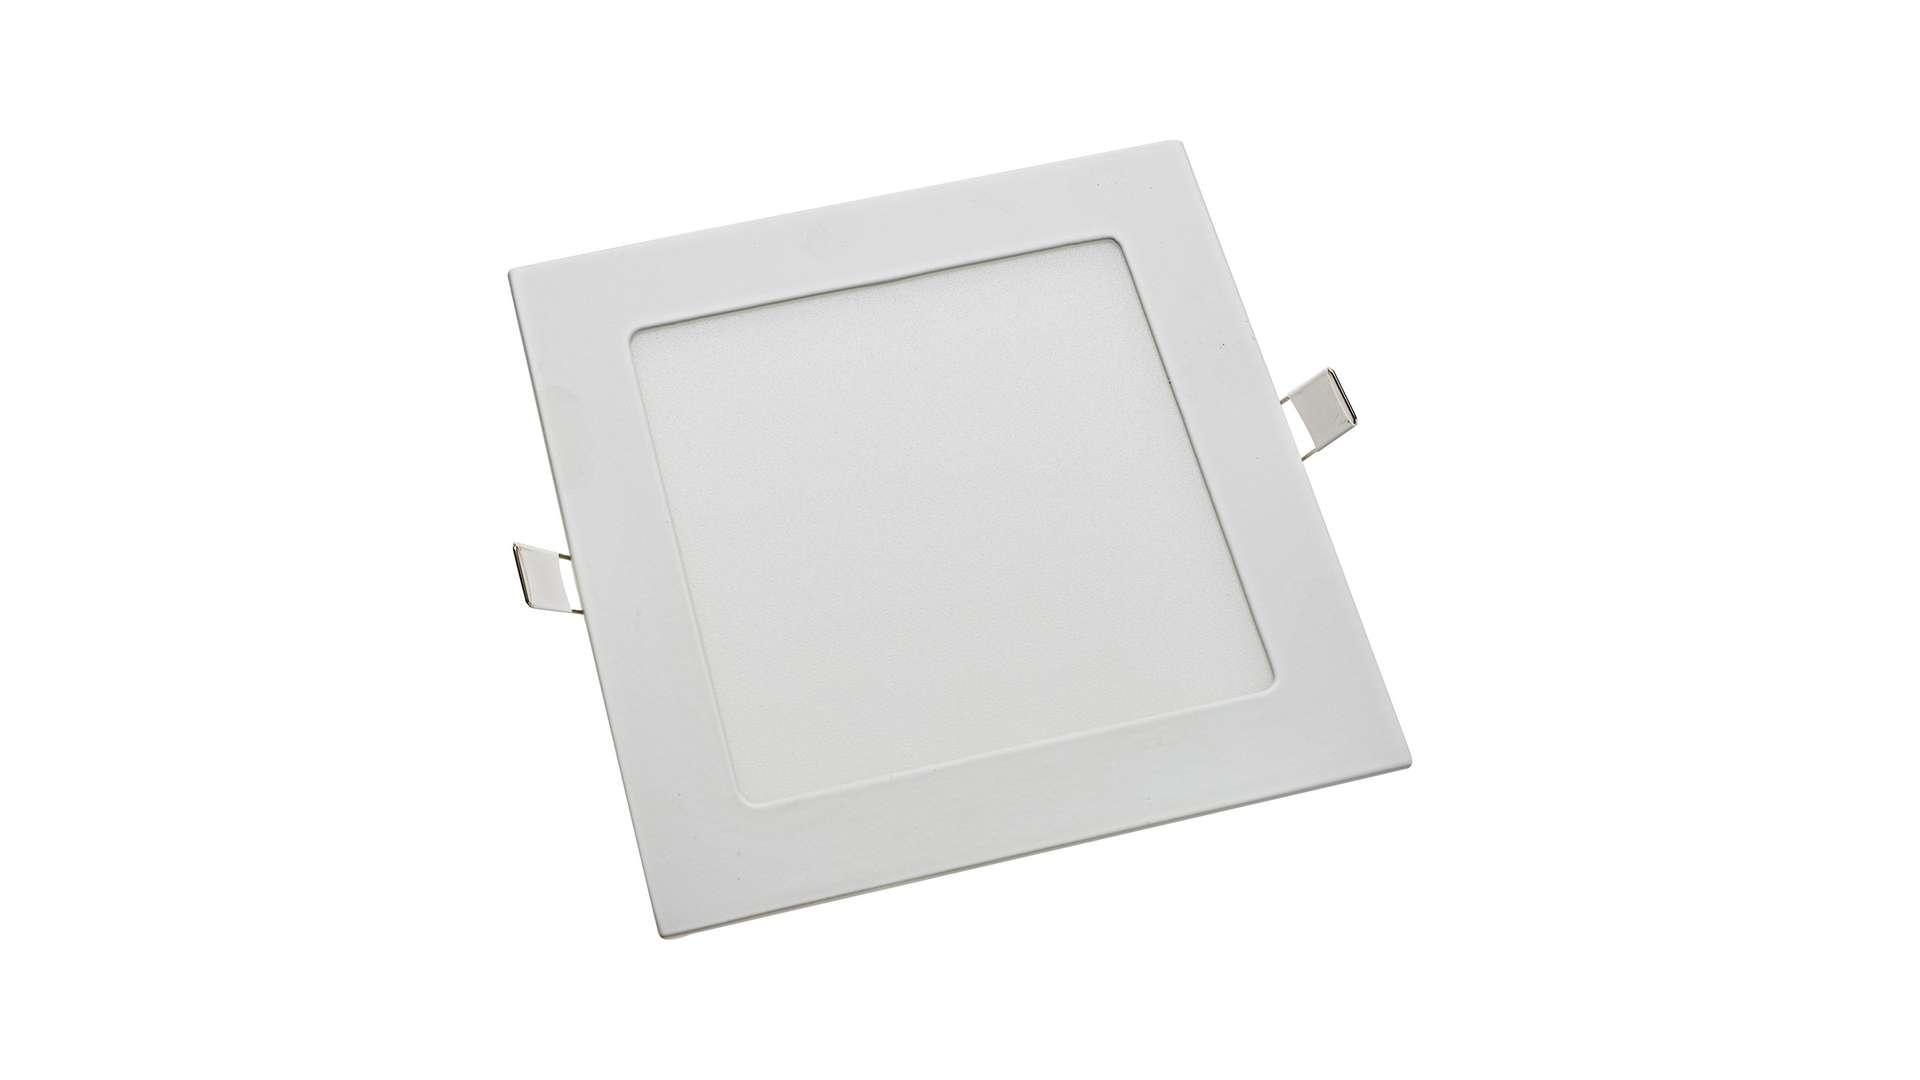 LED Panel 12W square neutral white